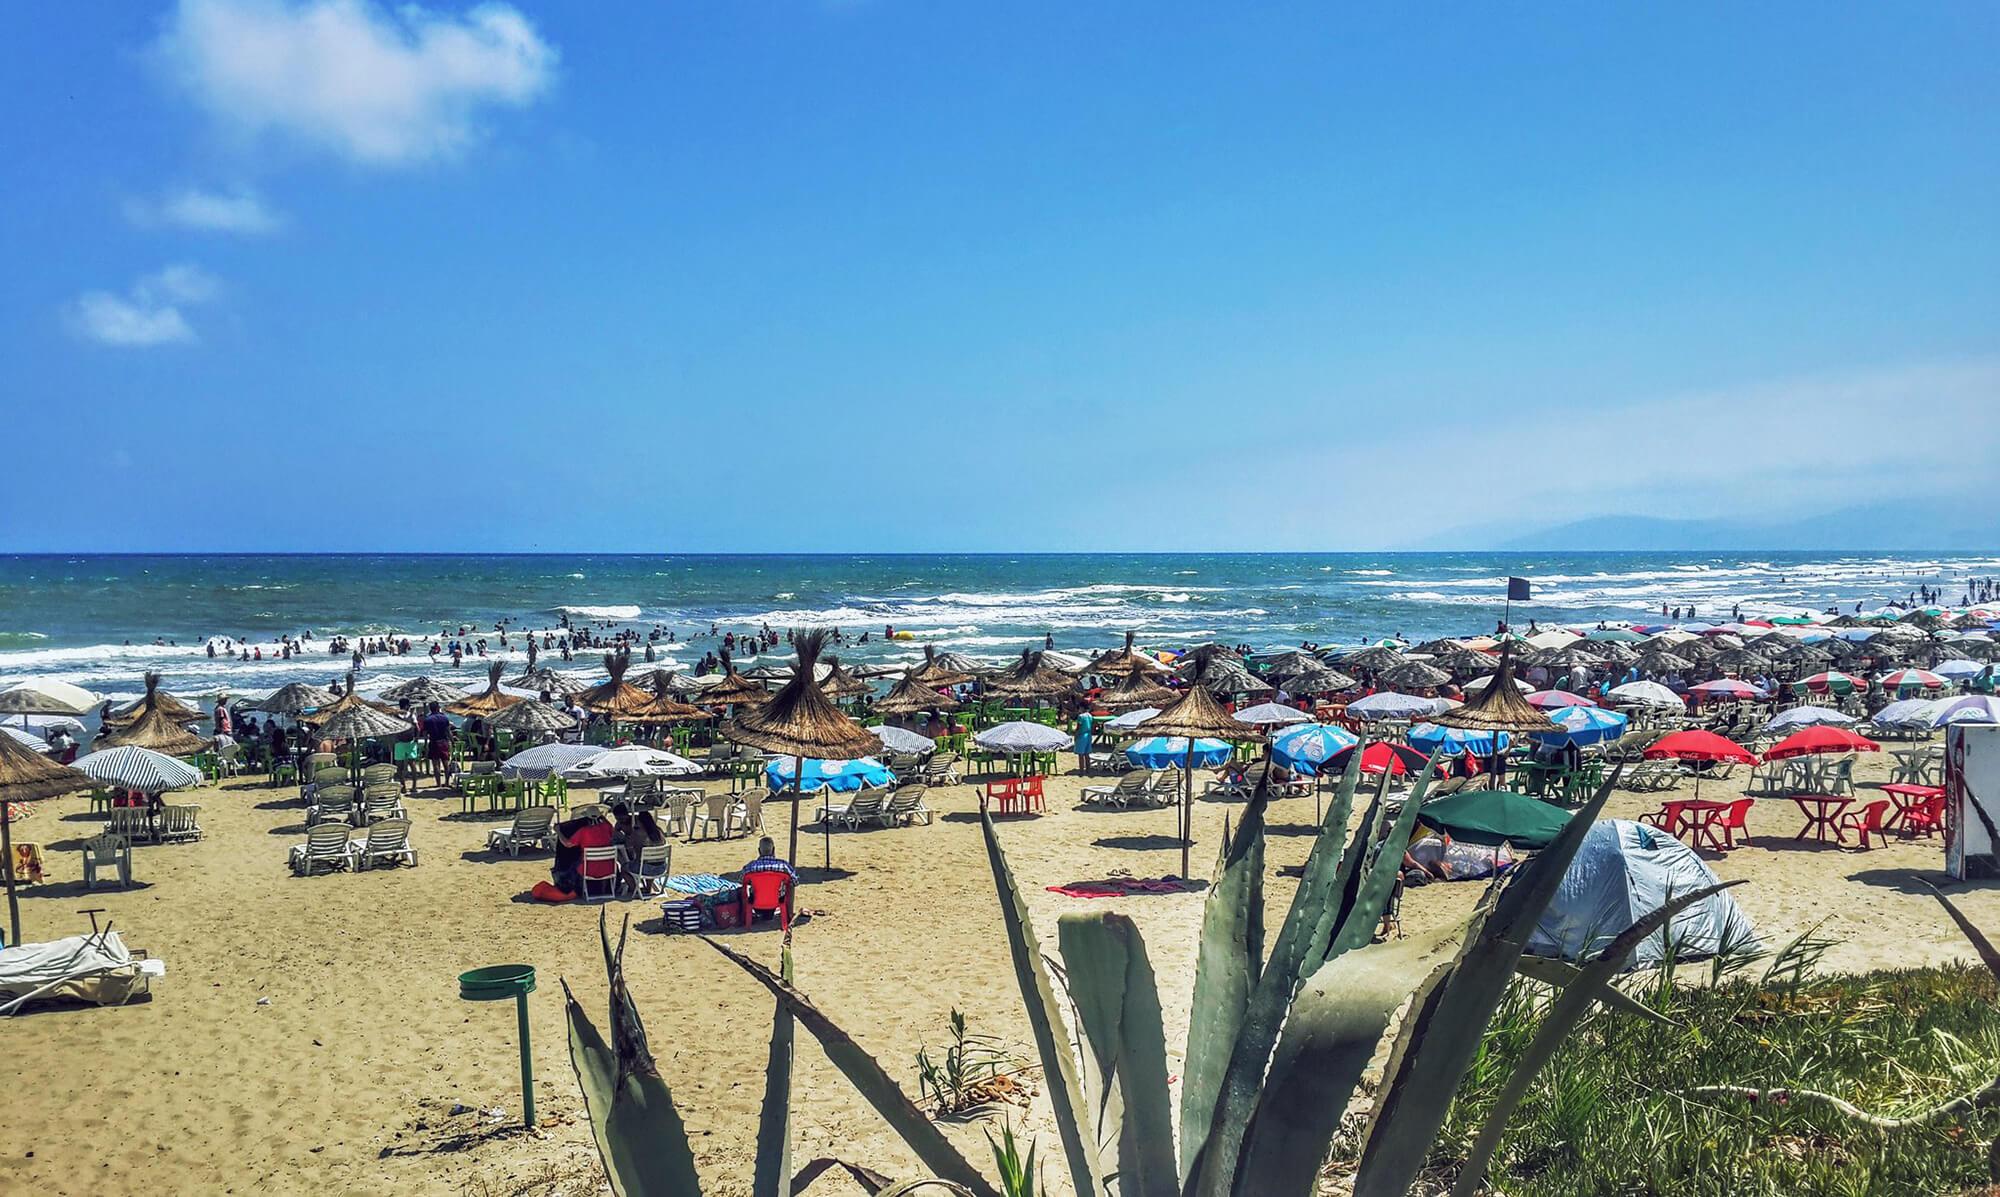 Best Beaches of Morocco - Between Mediterranean and Atlantic Ocean - Cabo Negro Beach